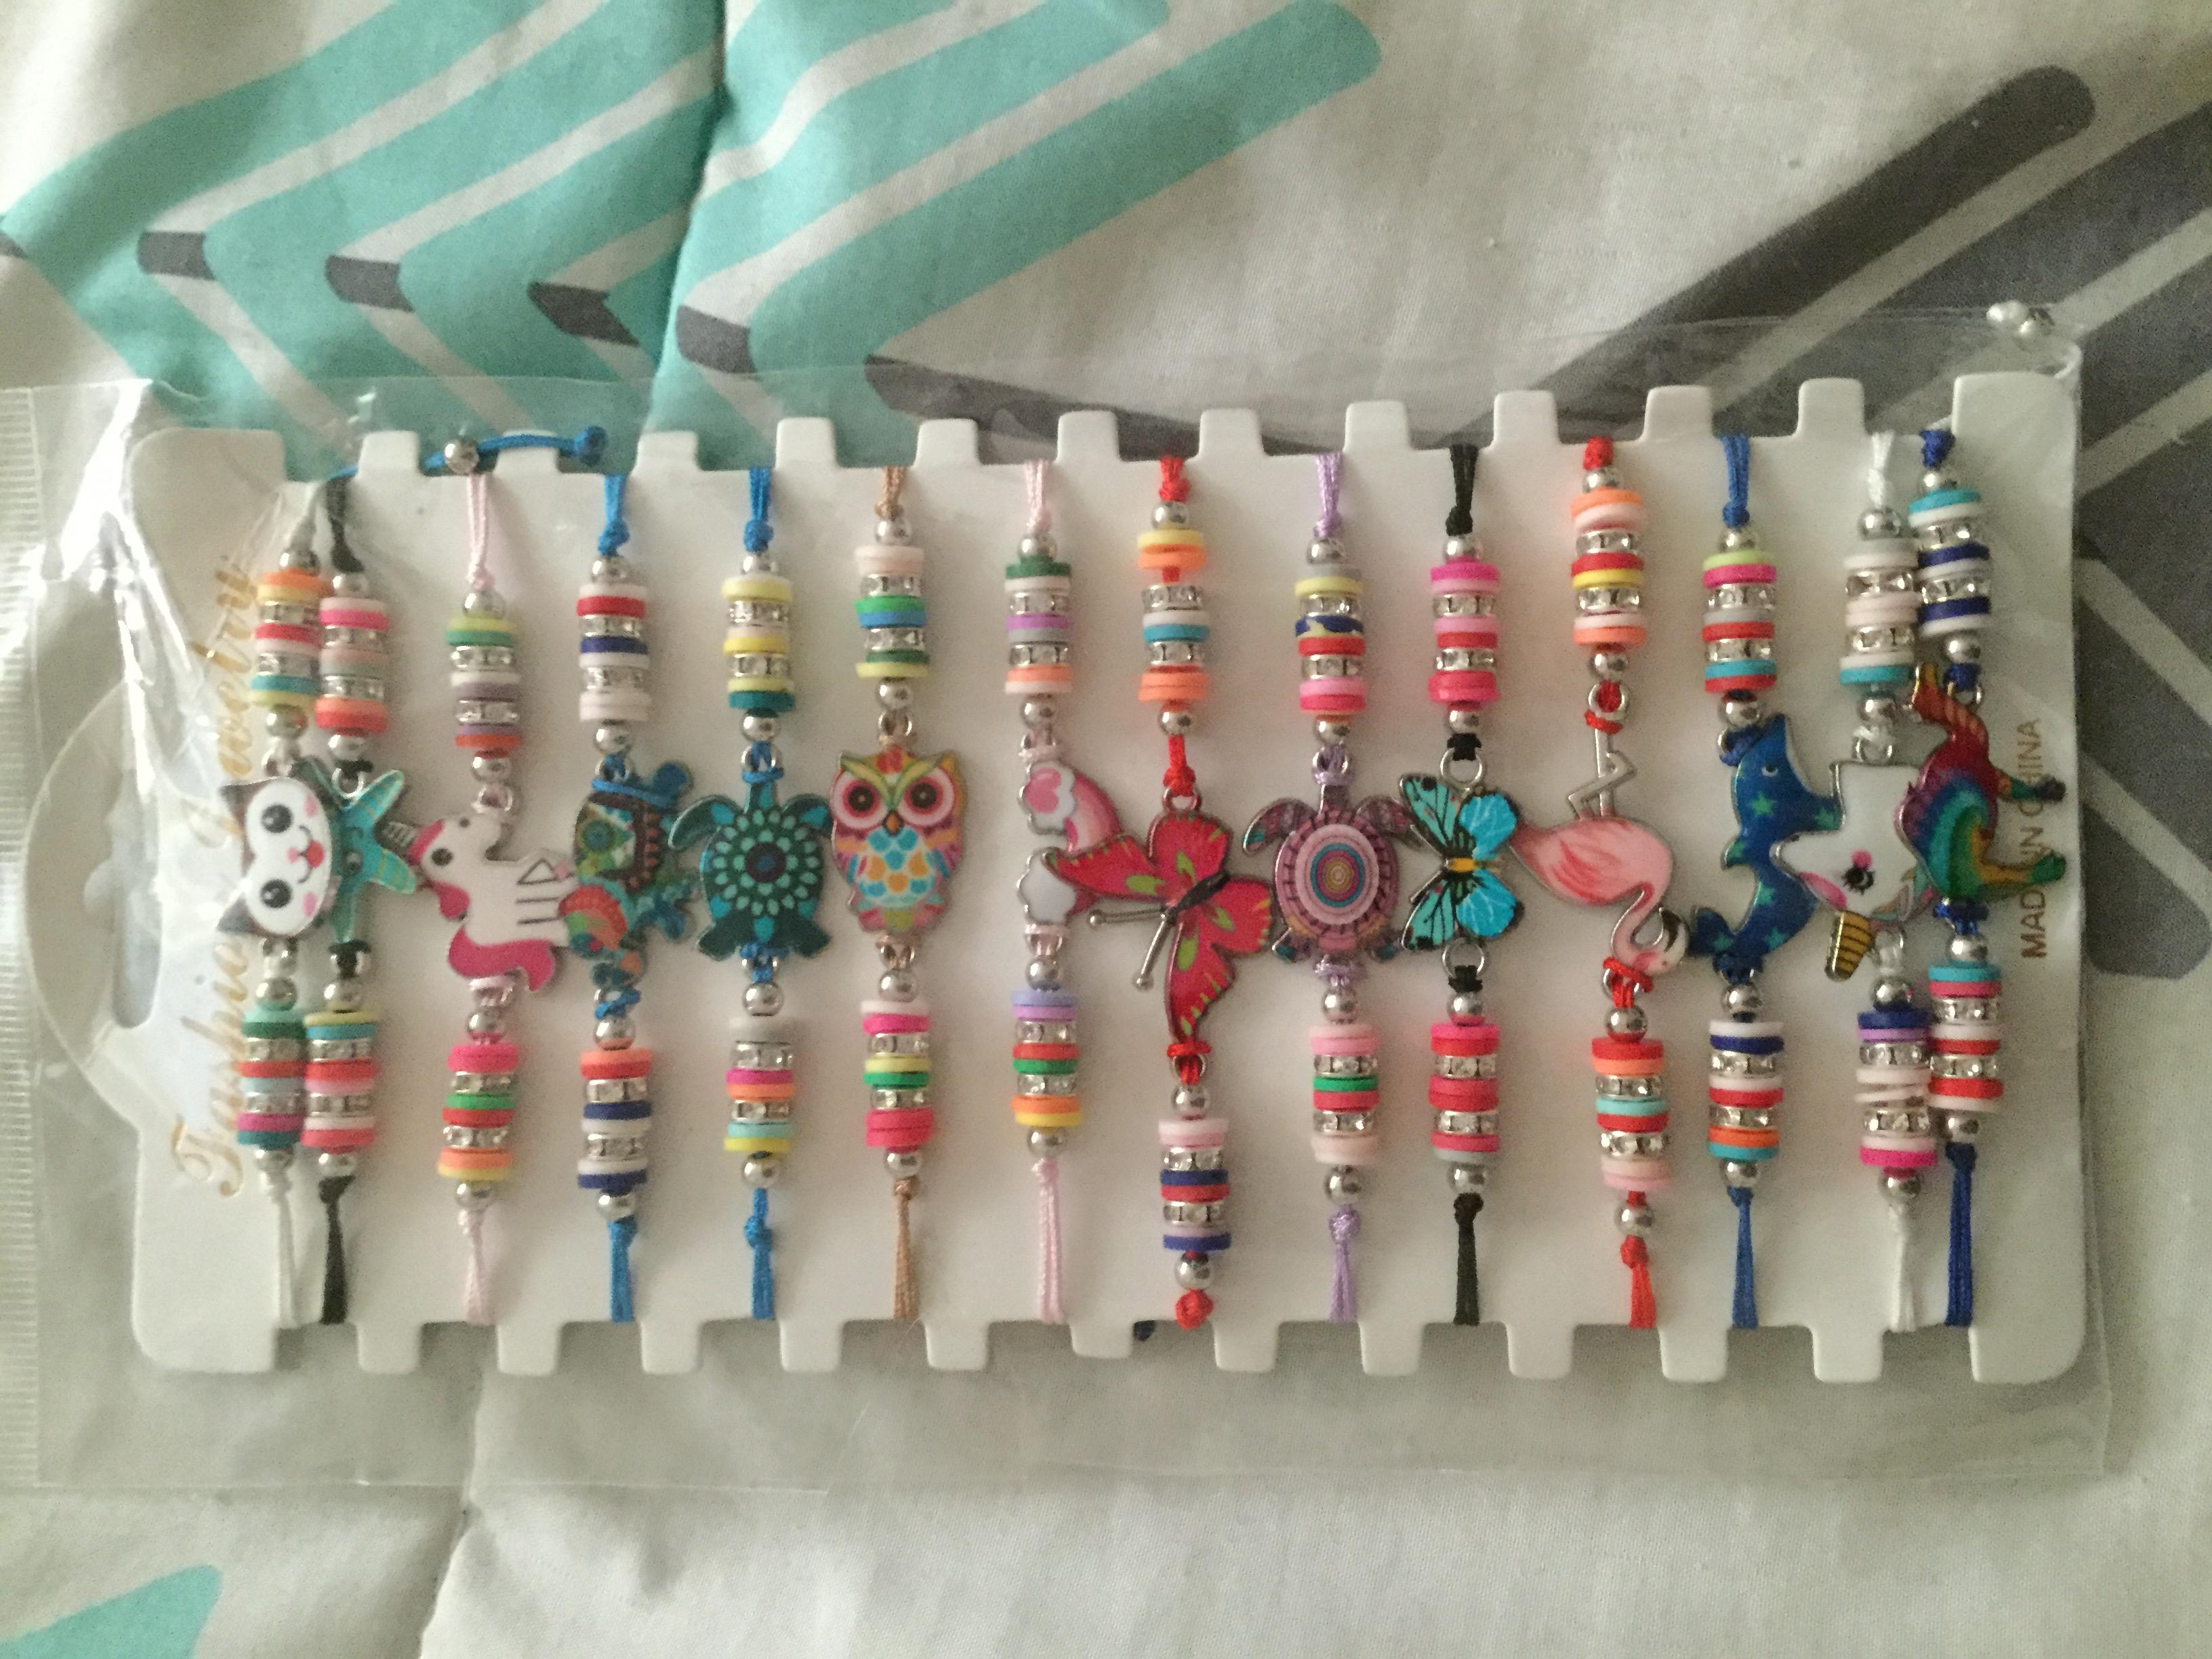 Such cute bracelets